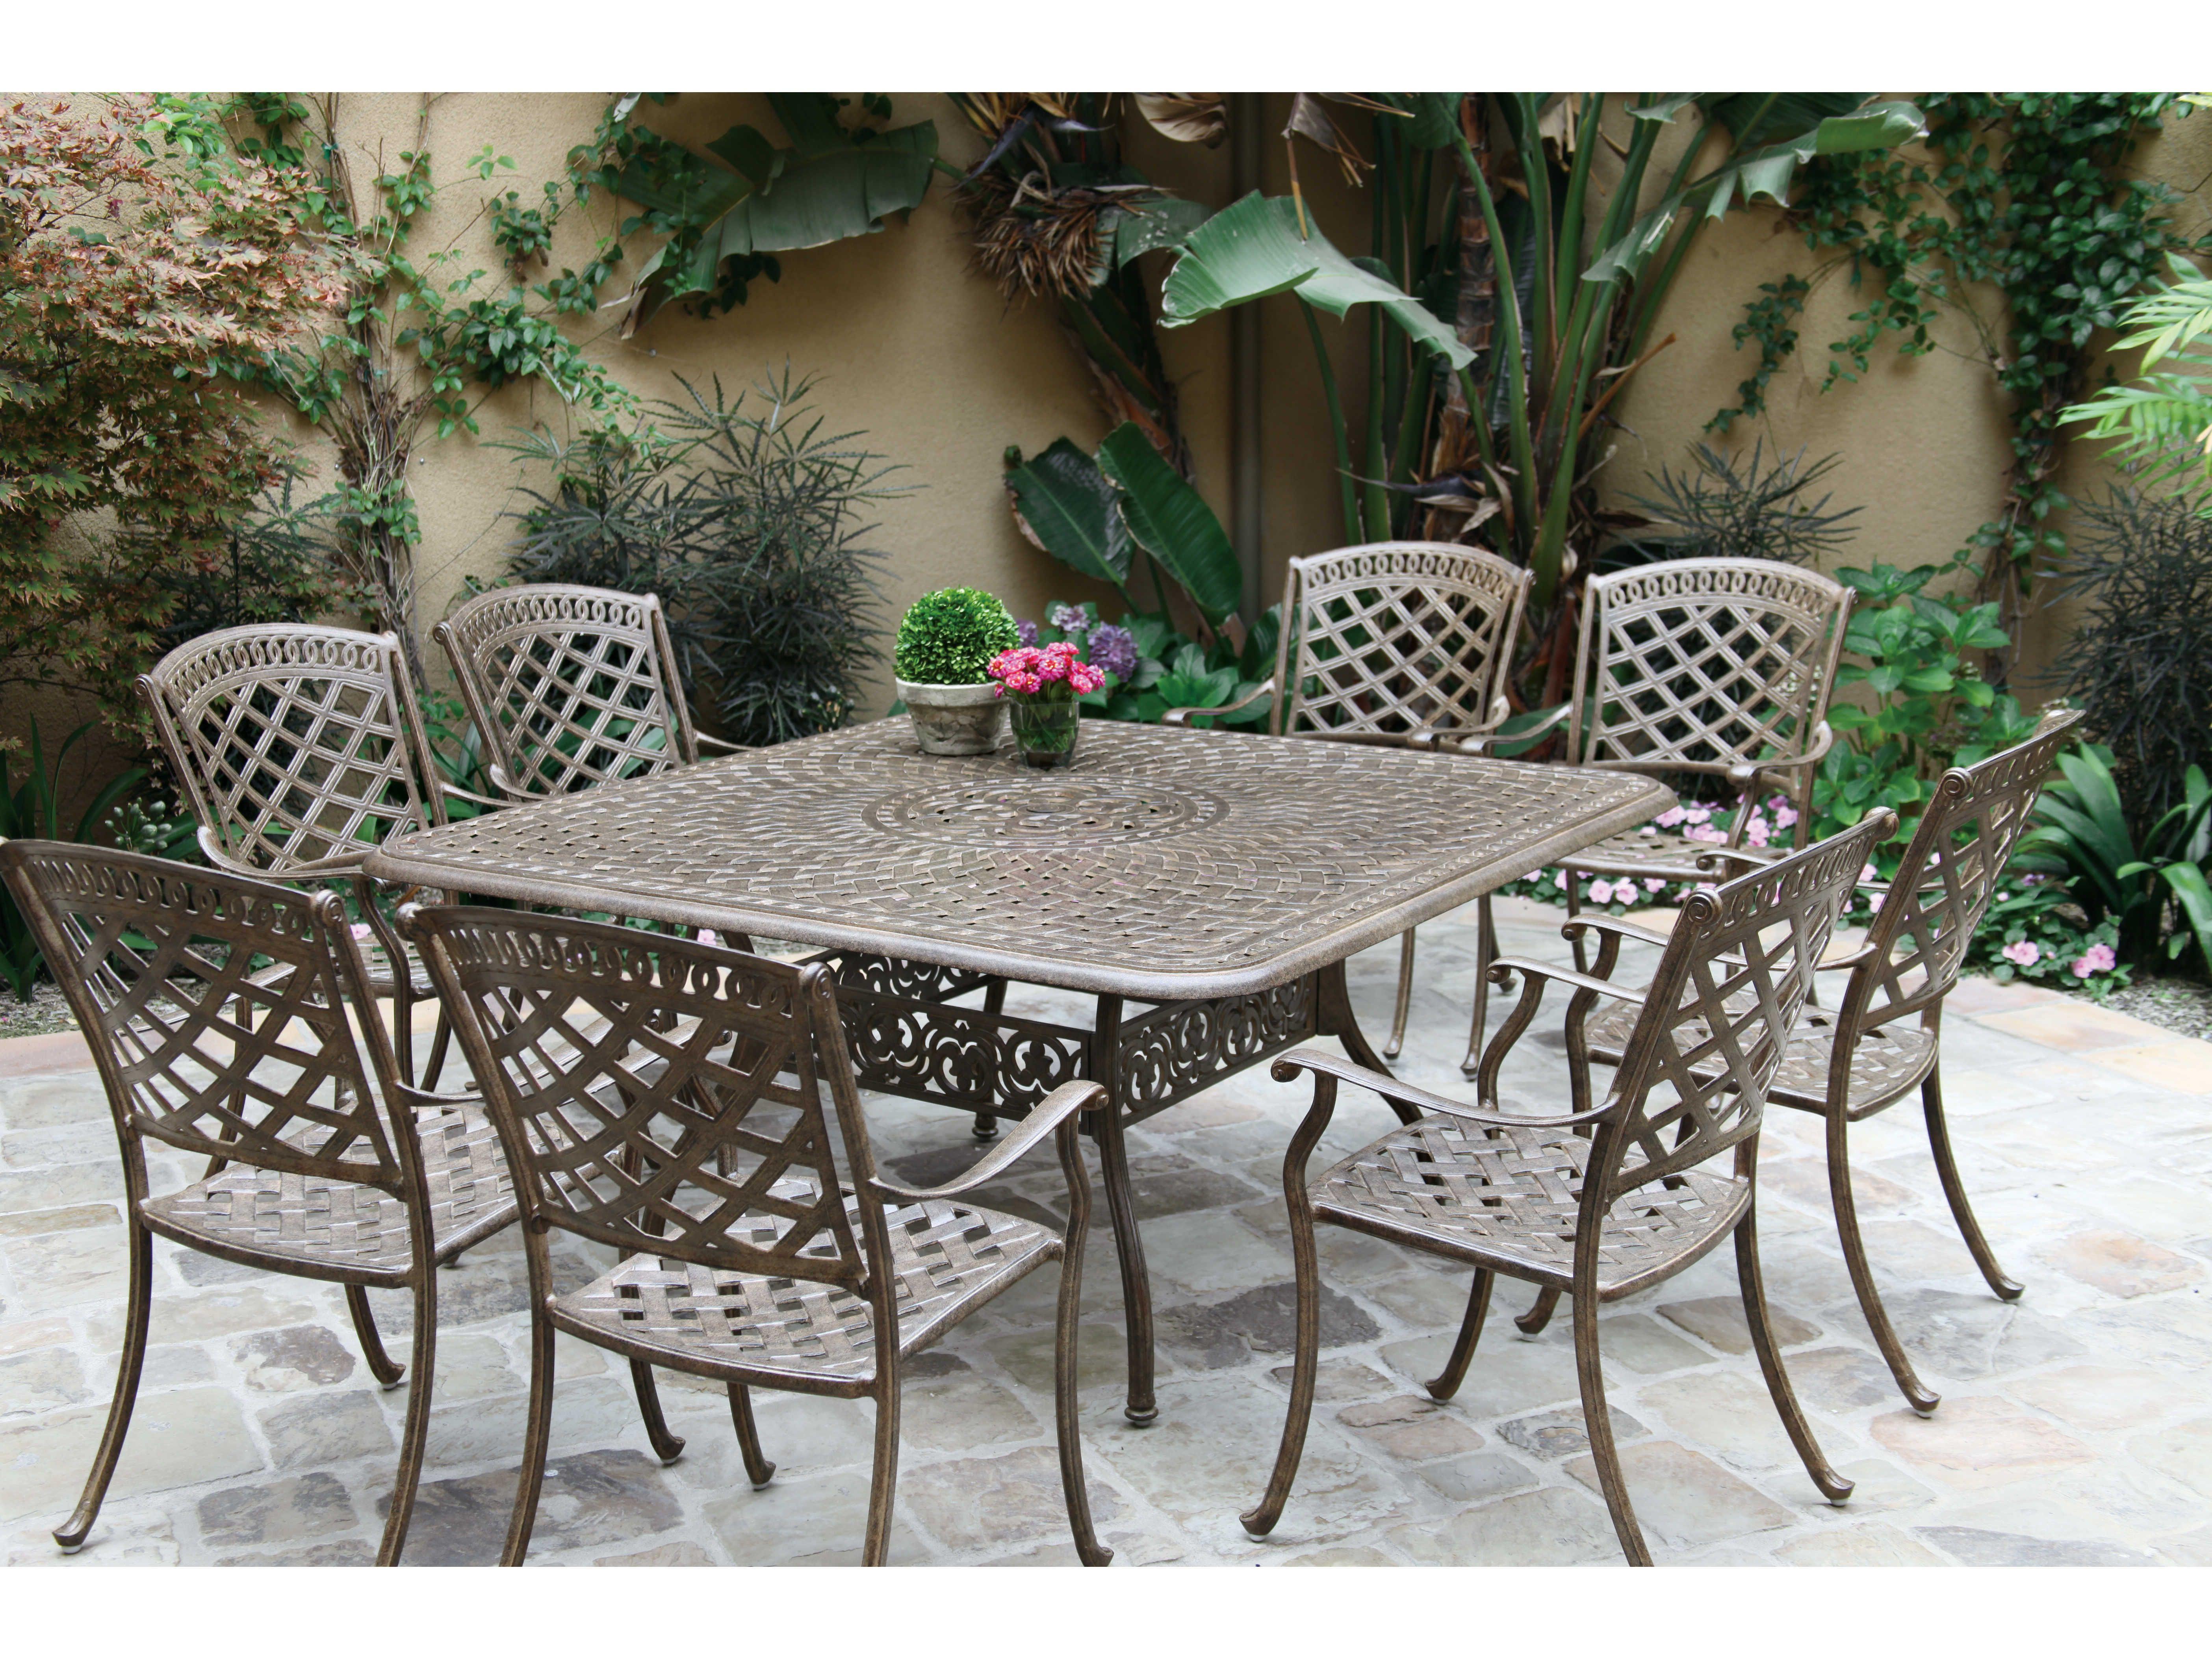 Astounding Darlee Outdoor Living Standard Sedona Cast Aluminum Dining Interior Design Ideas Clesiryabchikinfo